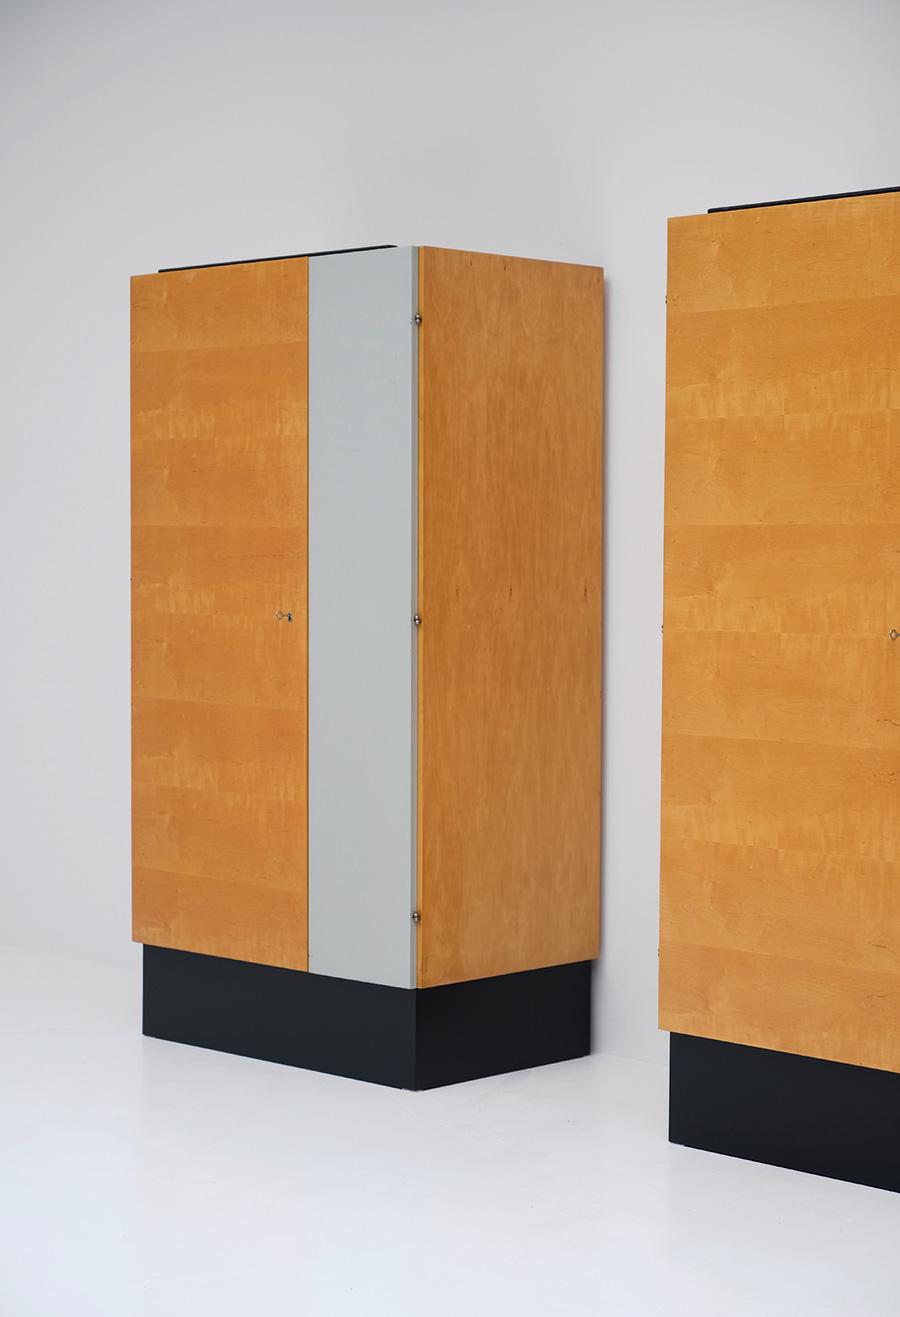 Pair of Modernist 50s Wardrobesimage 7